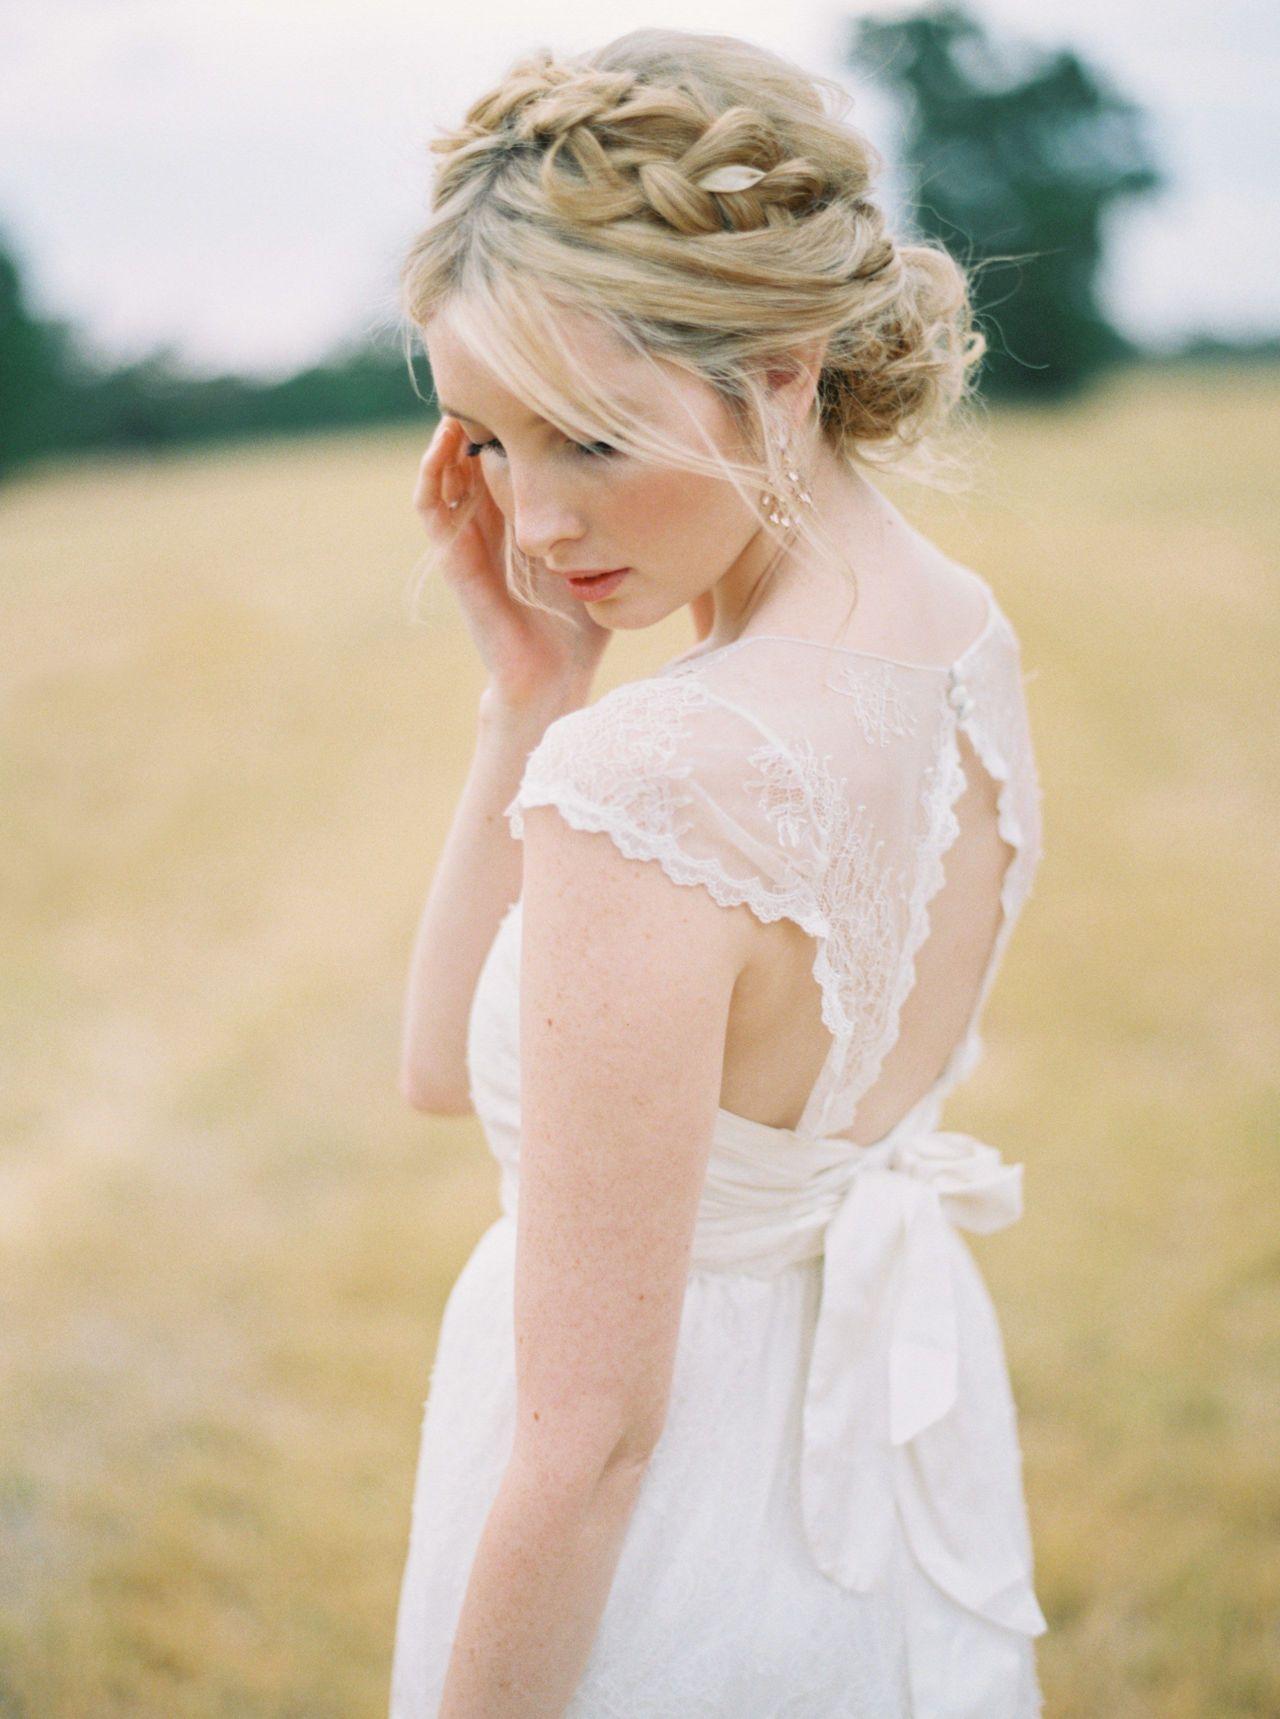 9 free-spirited ways to be a gorgeous bohemian bride | hair